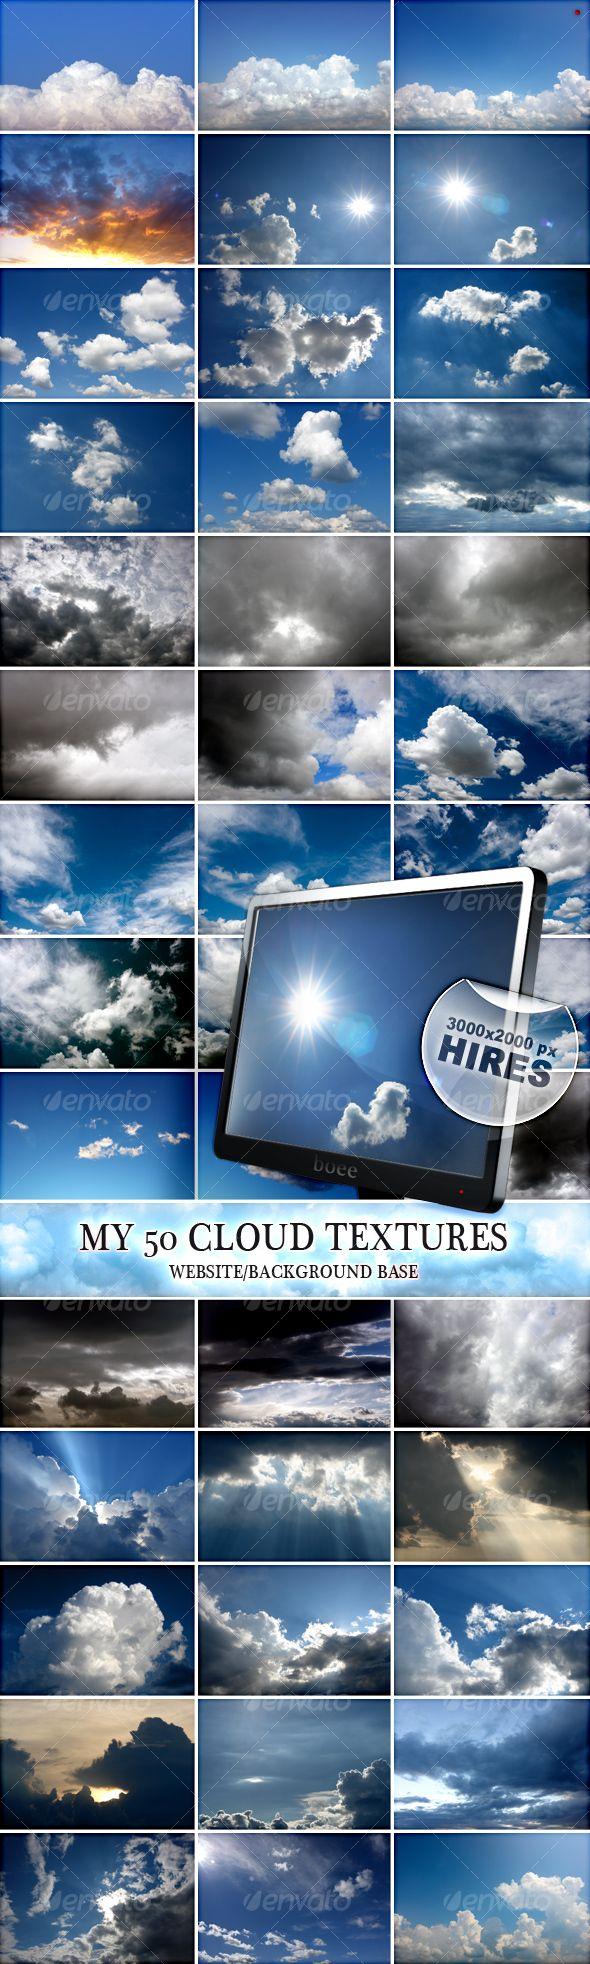 My 50 Cloud Textures